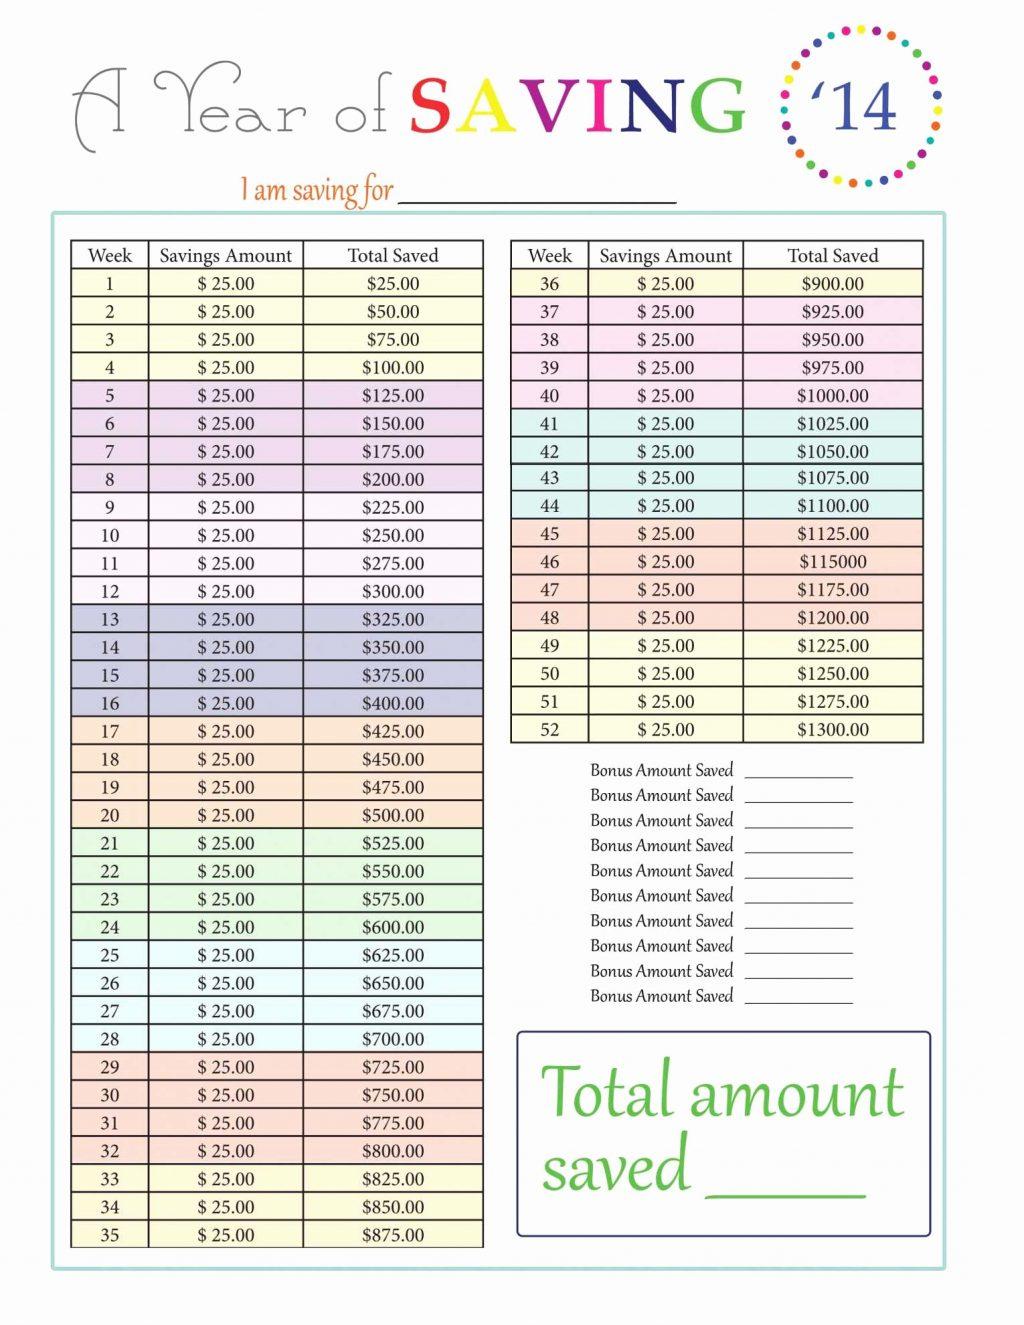 Credit Card Payoff Spreadsheet 2018 Debt Snowball Spreadsheet Credit to Credit Card Debt Payoff Spreadsheet